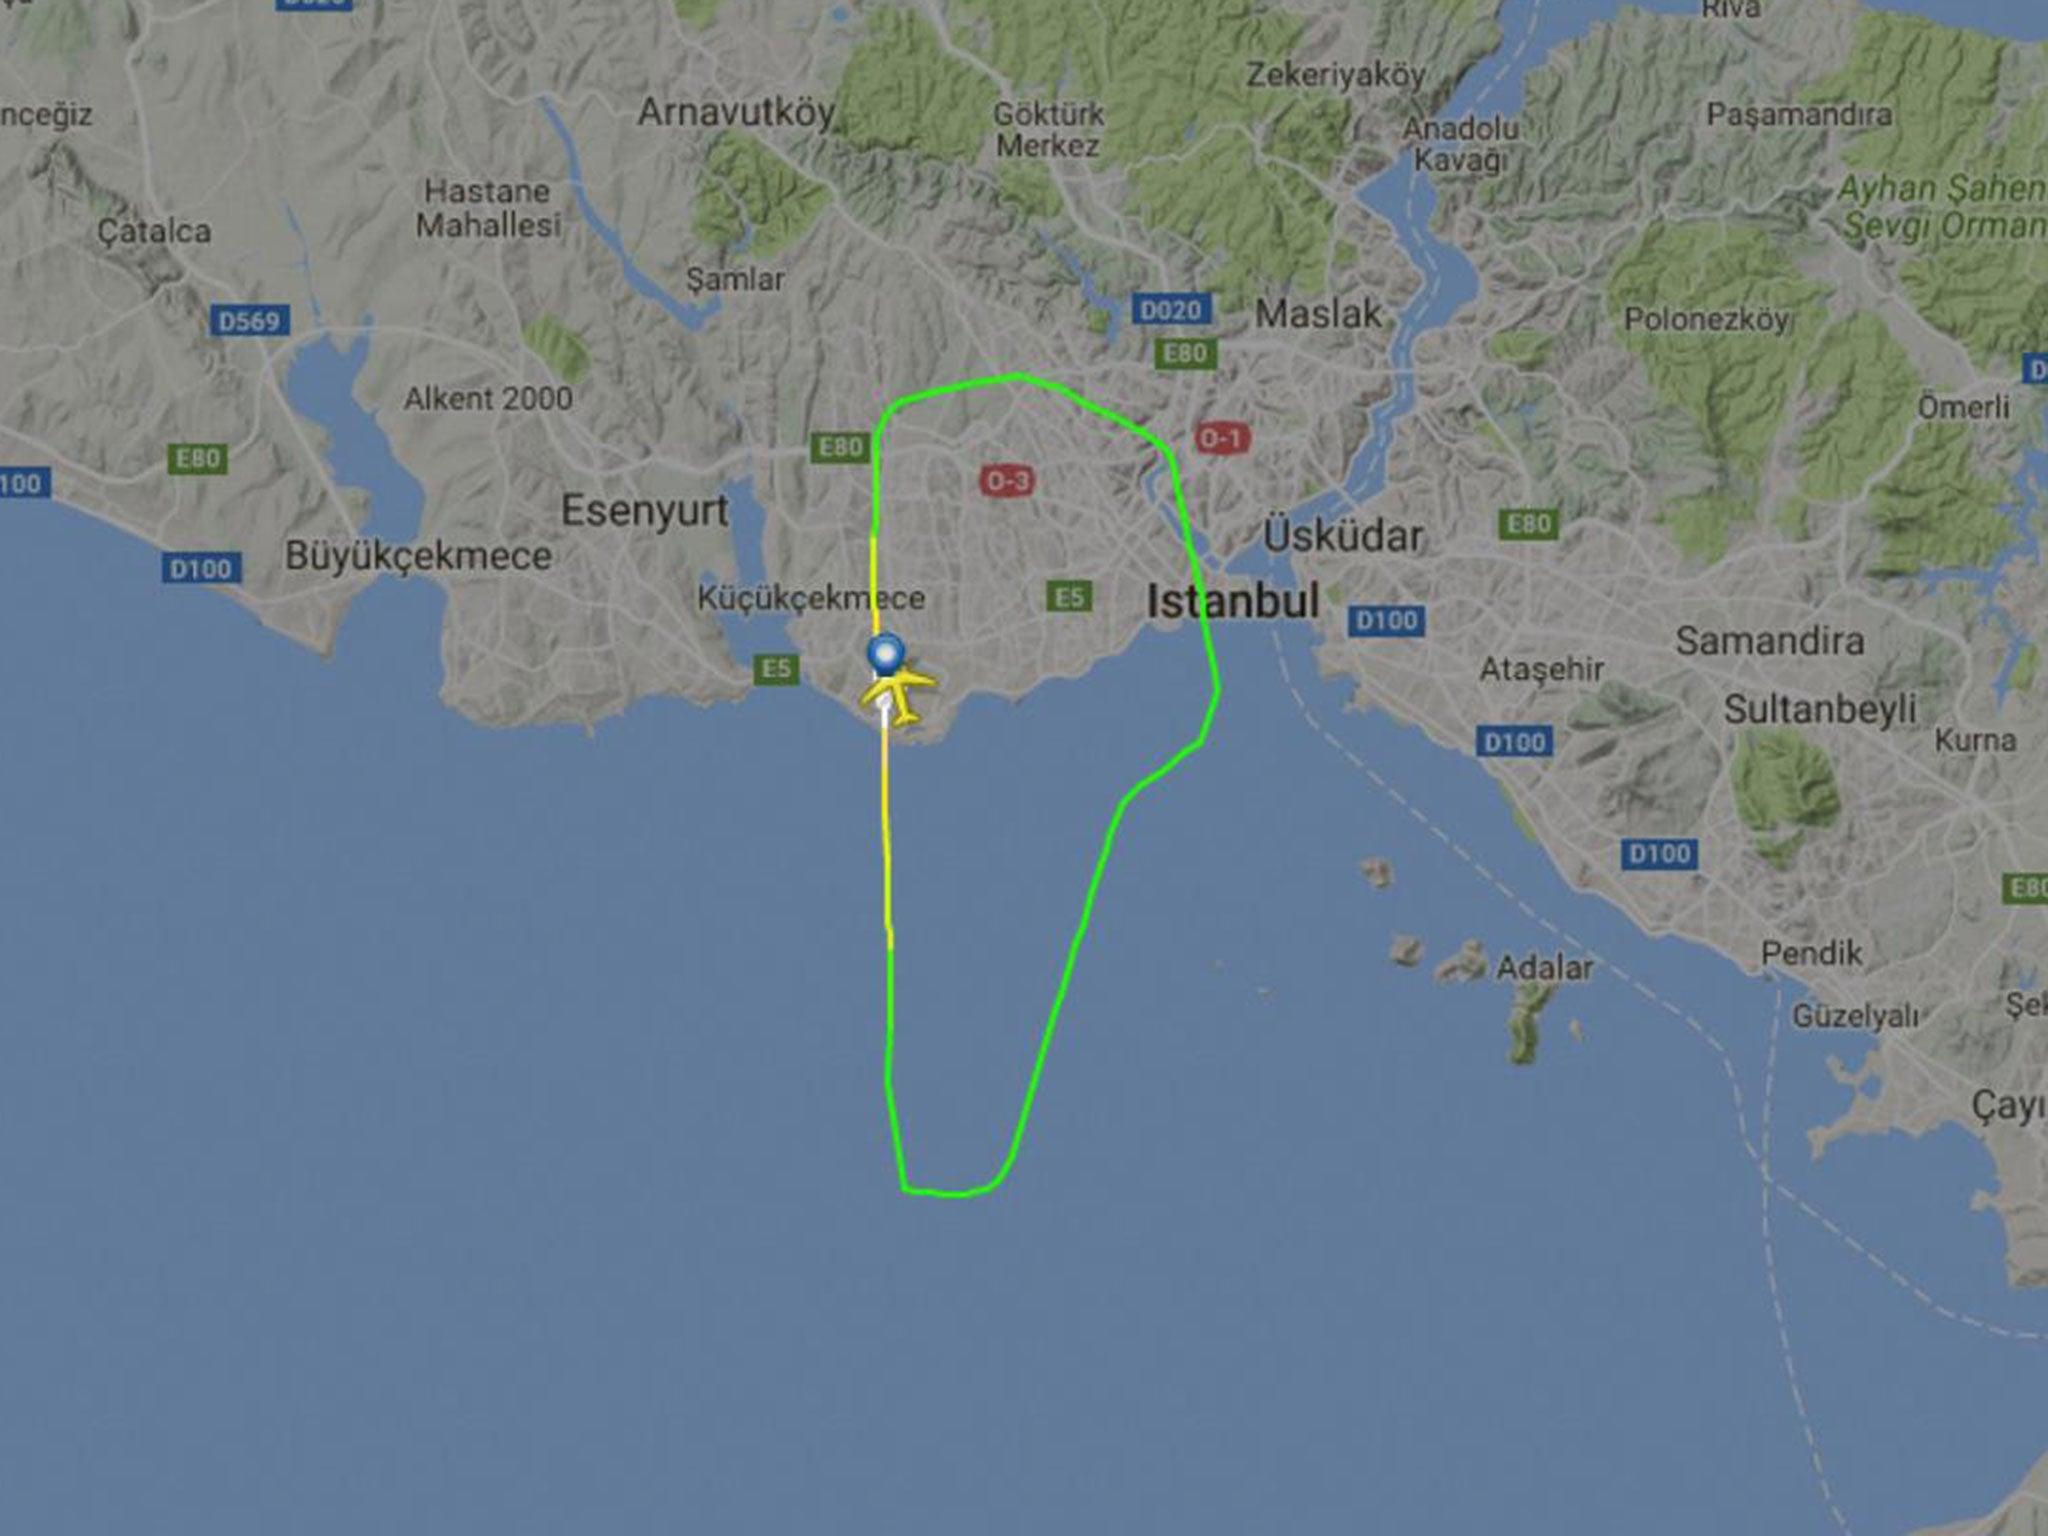 Qatar Airways plane makes emergency landing at Istanbul